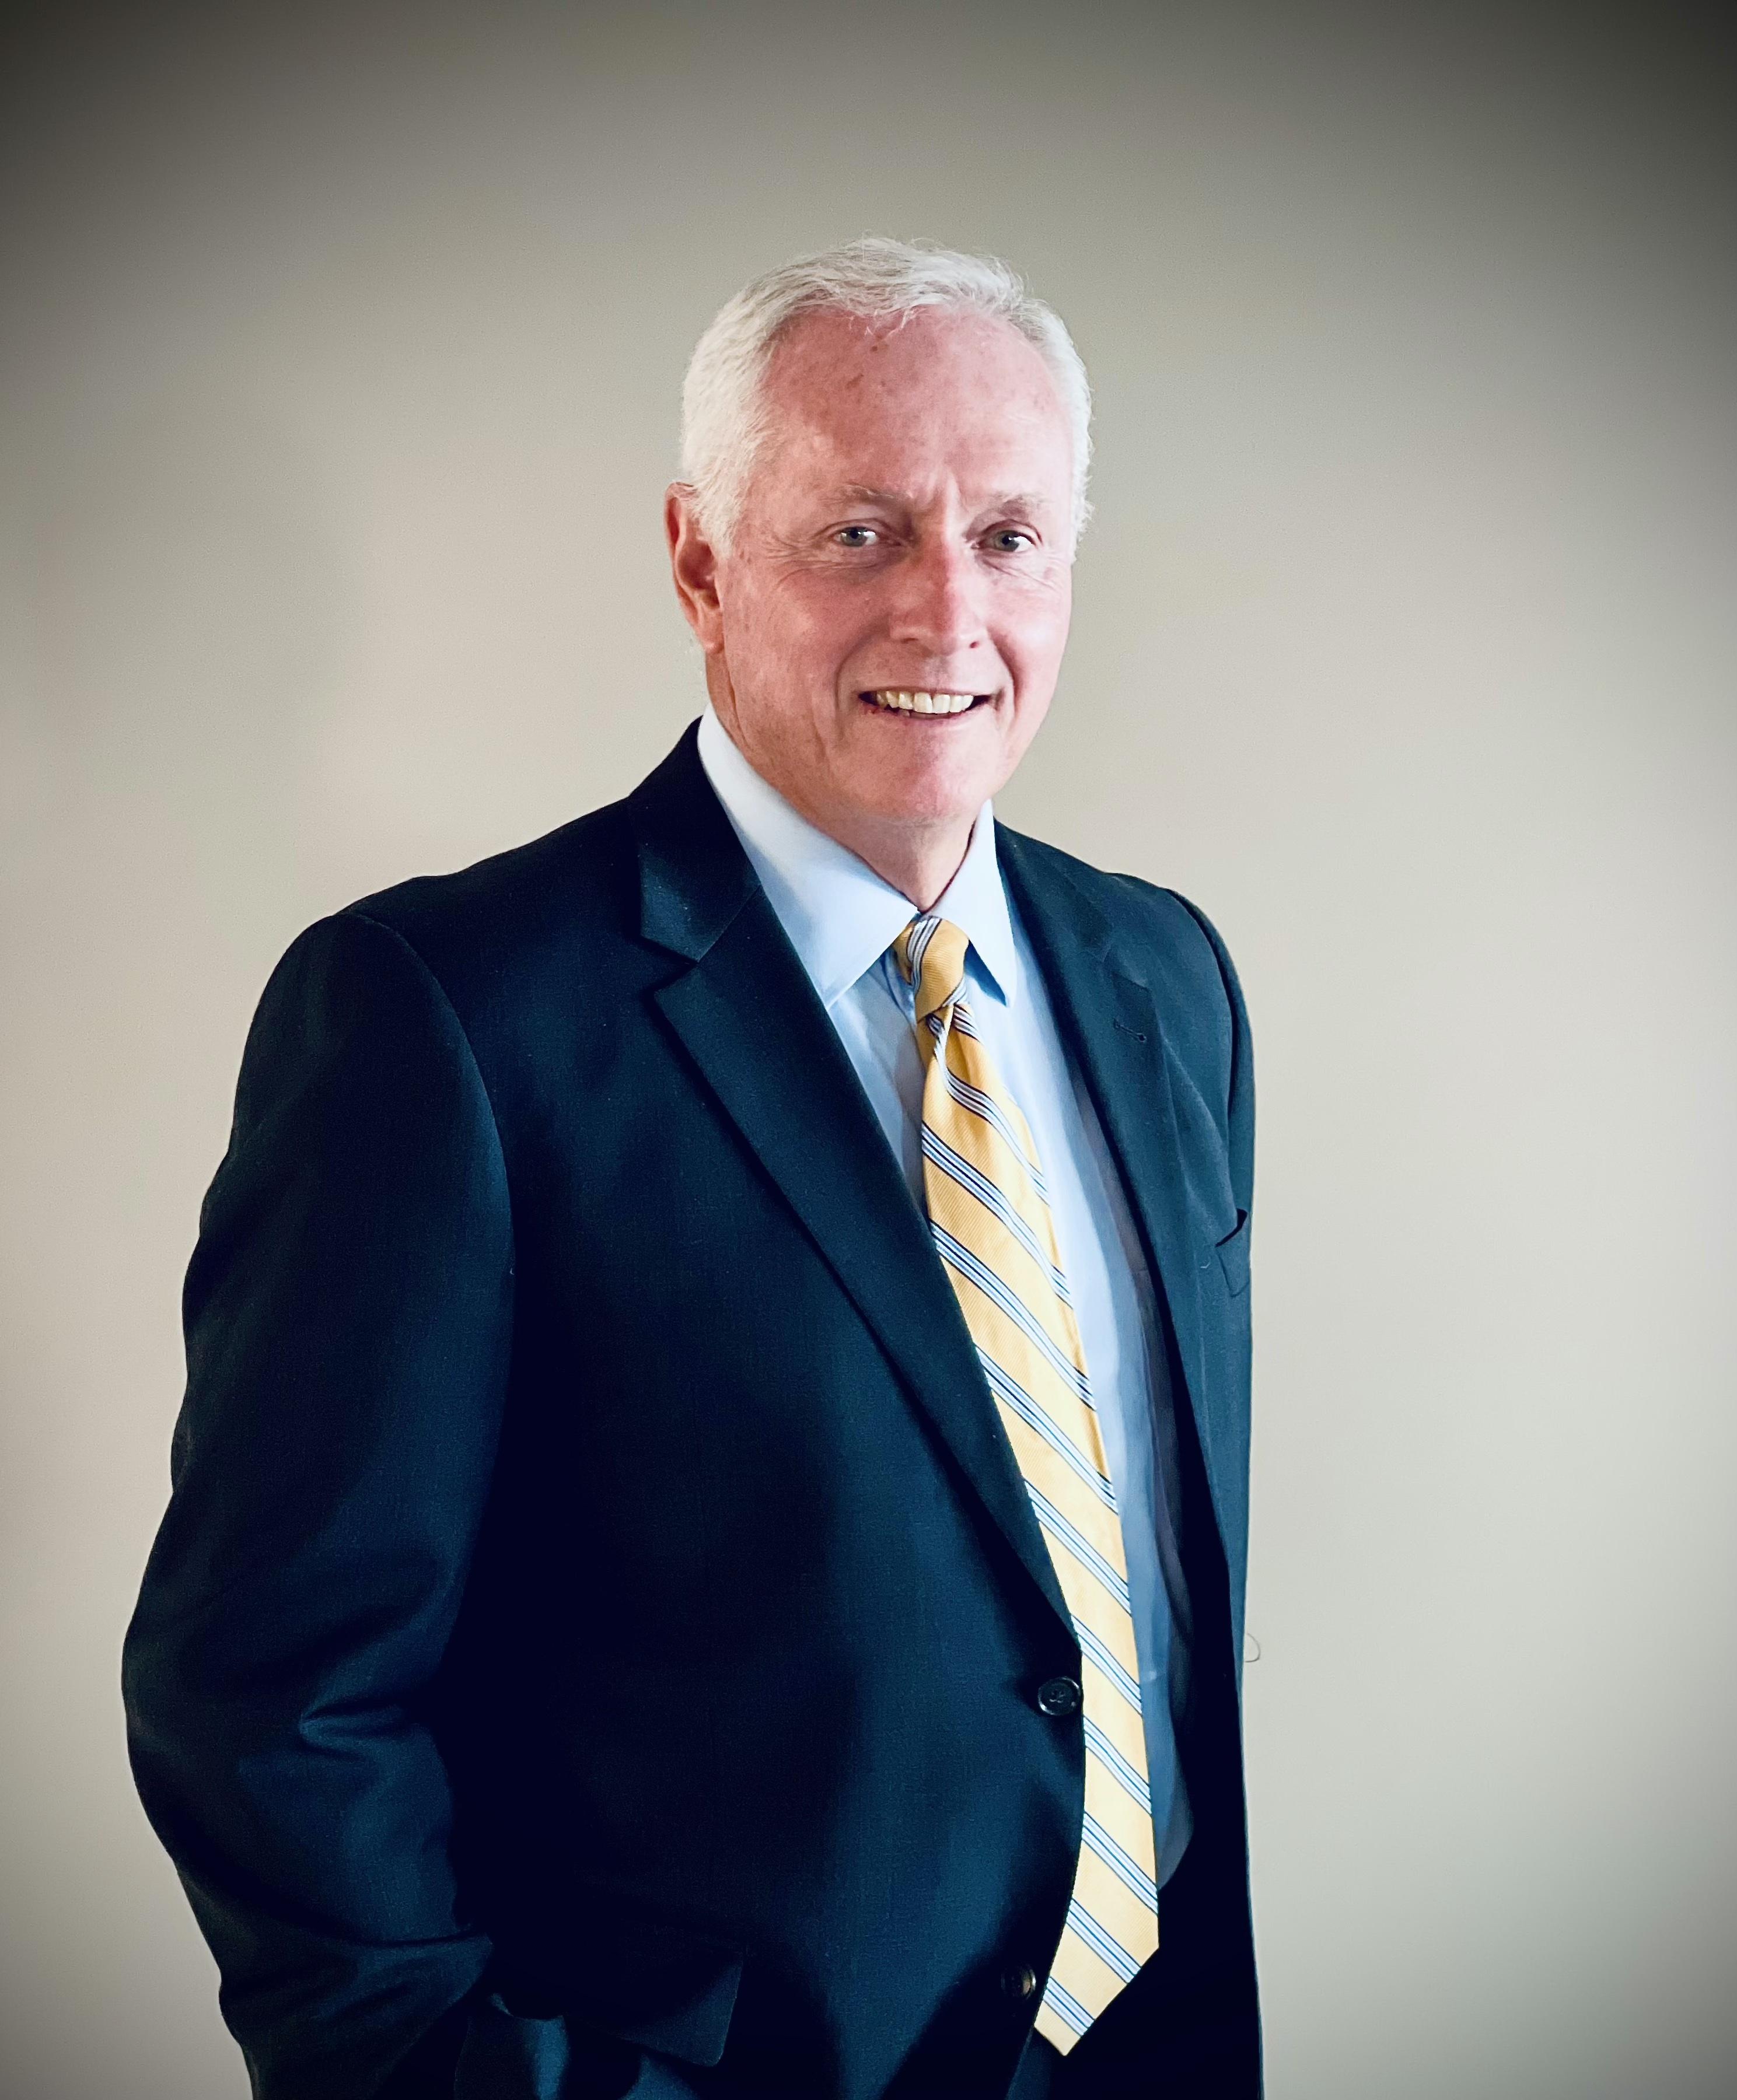 Profile photo of bernie the lawyer